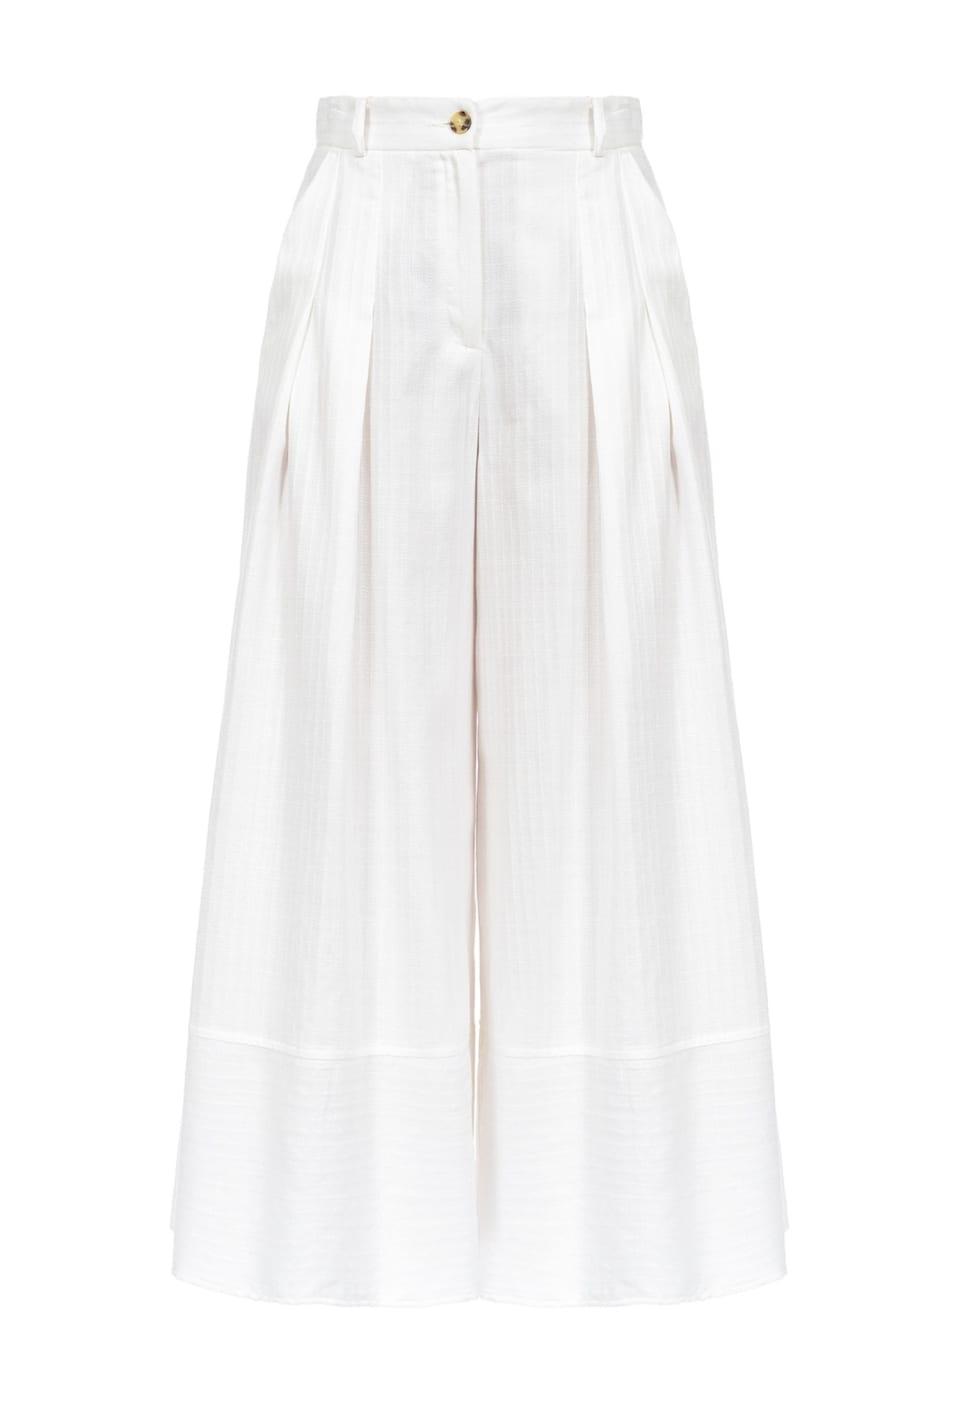 Cotton palazzo trousers